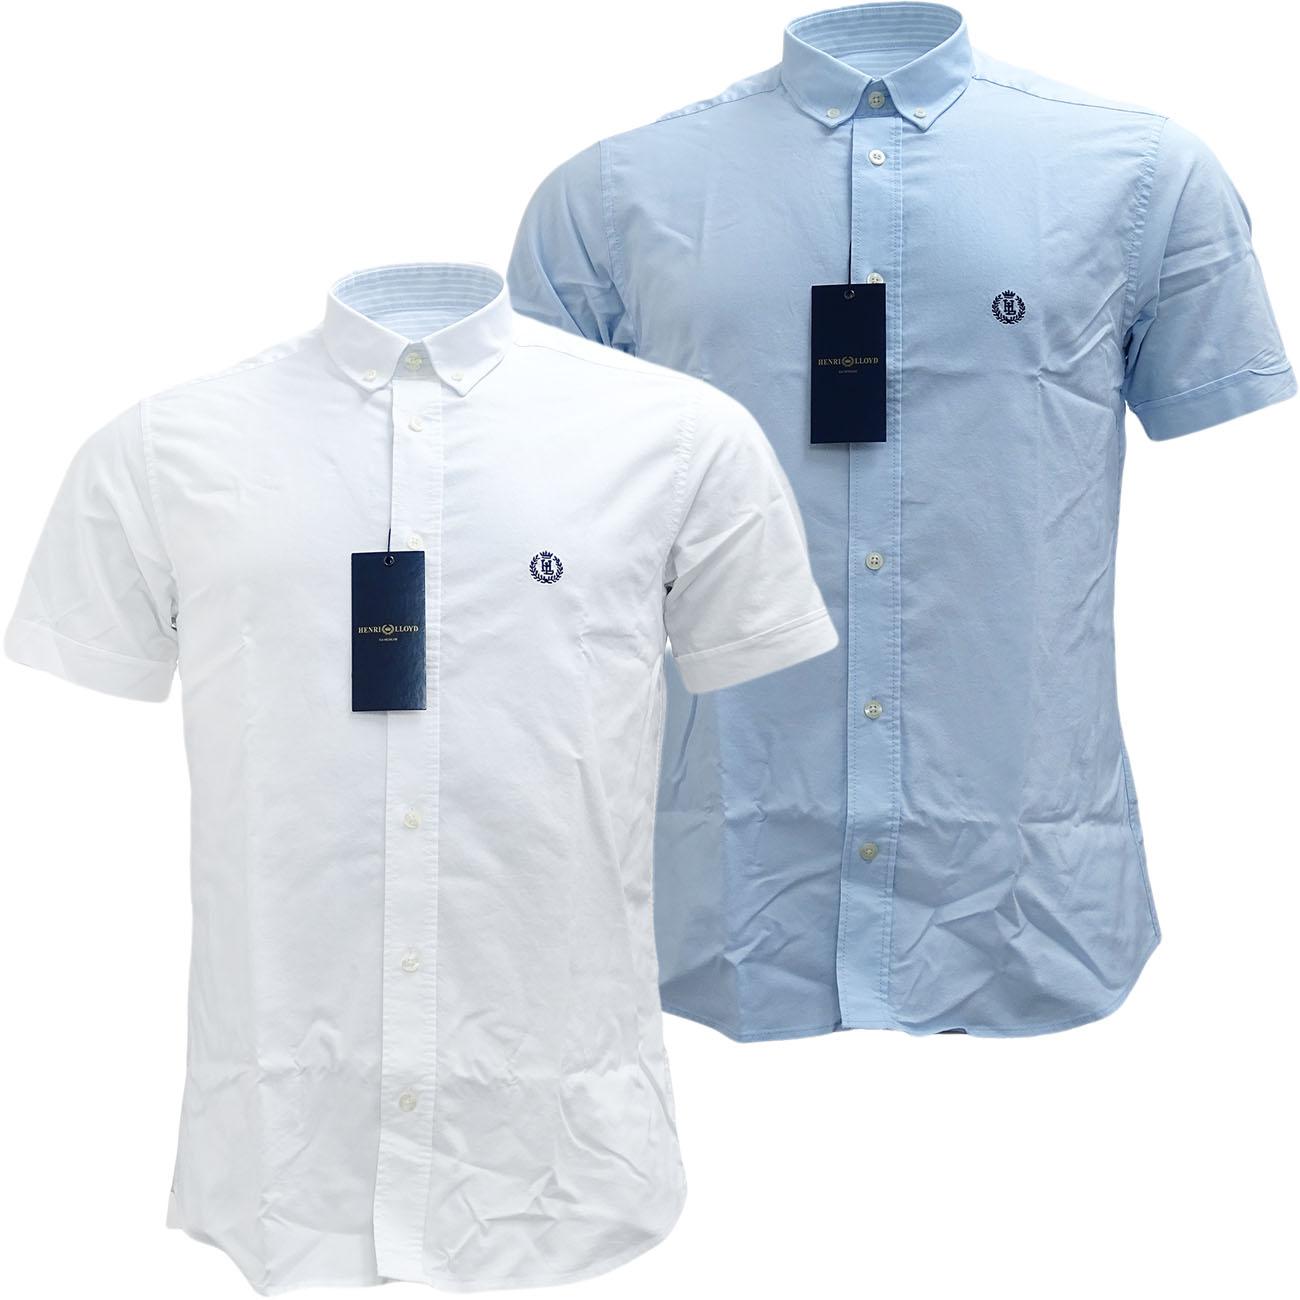 Henri Lloyd Plain Short Sleeve Oxford Shirt